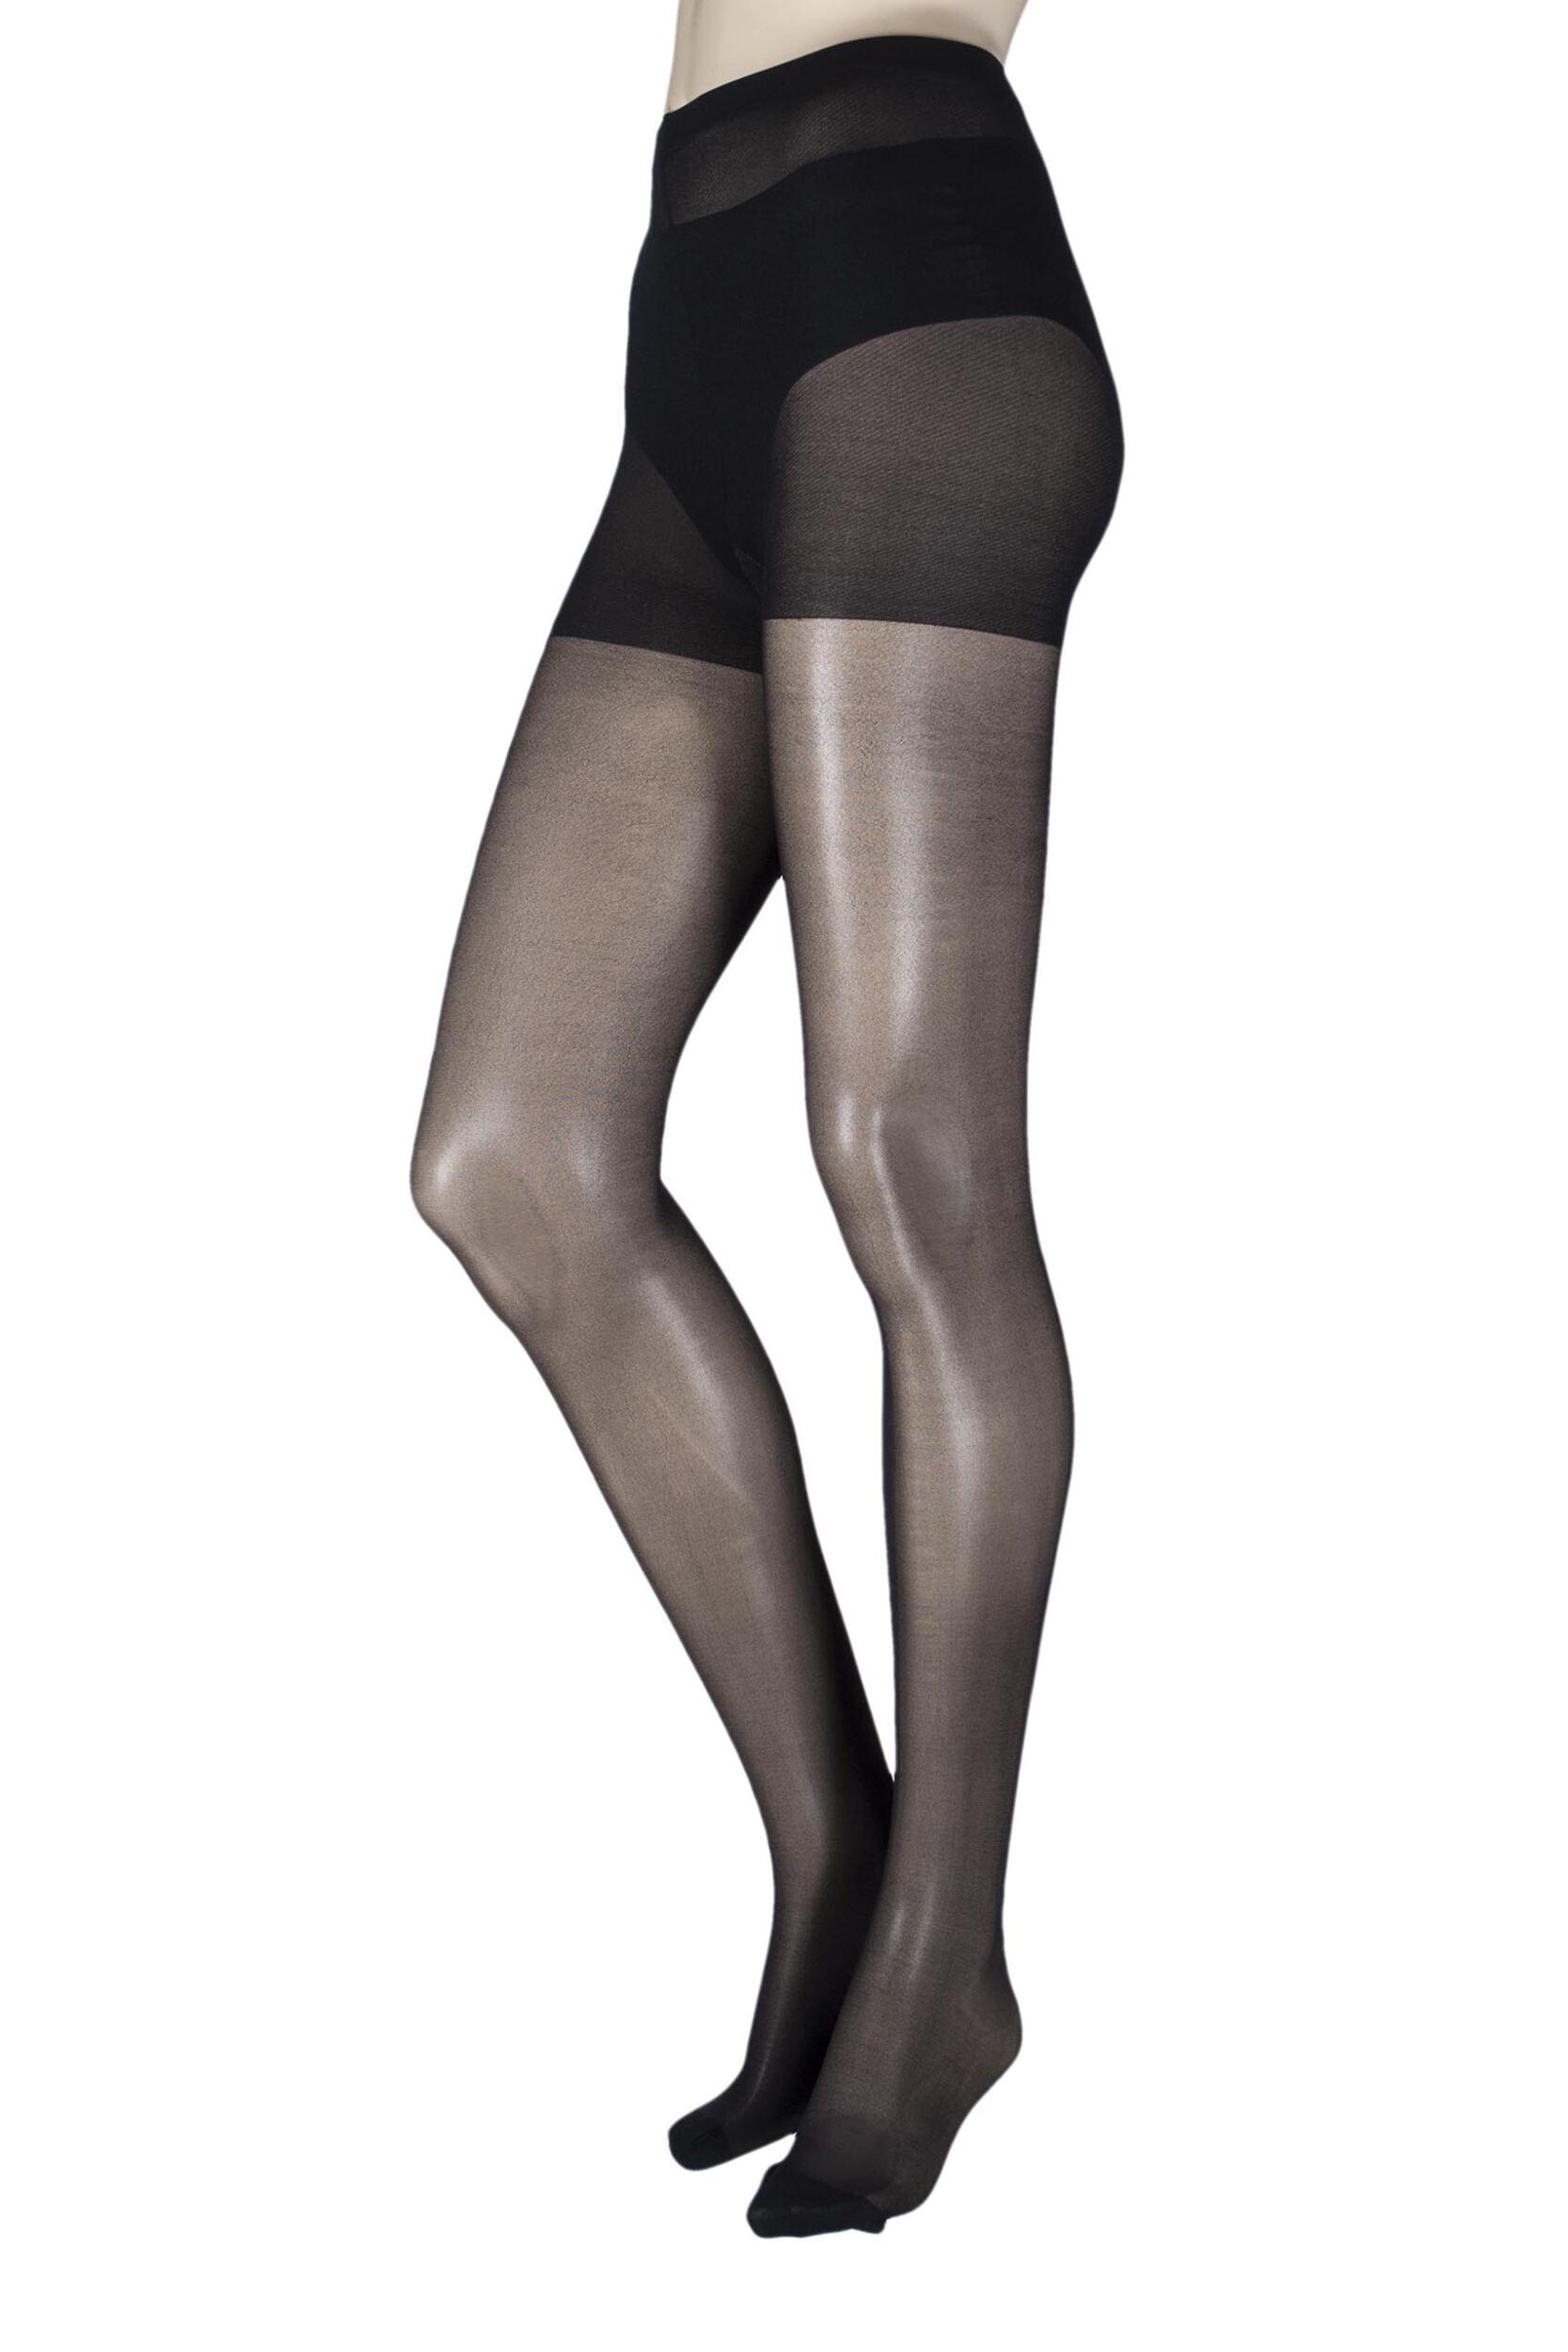 Image of 1 Pair Black 15 Denier Revitaliser Soft Shine Compression Tights Ladies Small/Medium - Pretty Legs